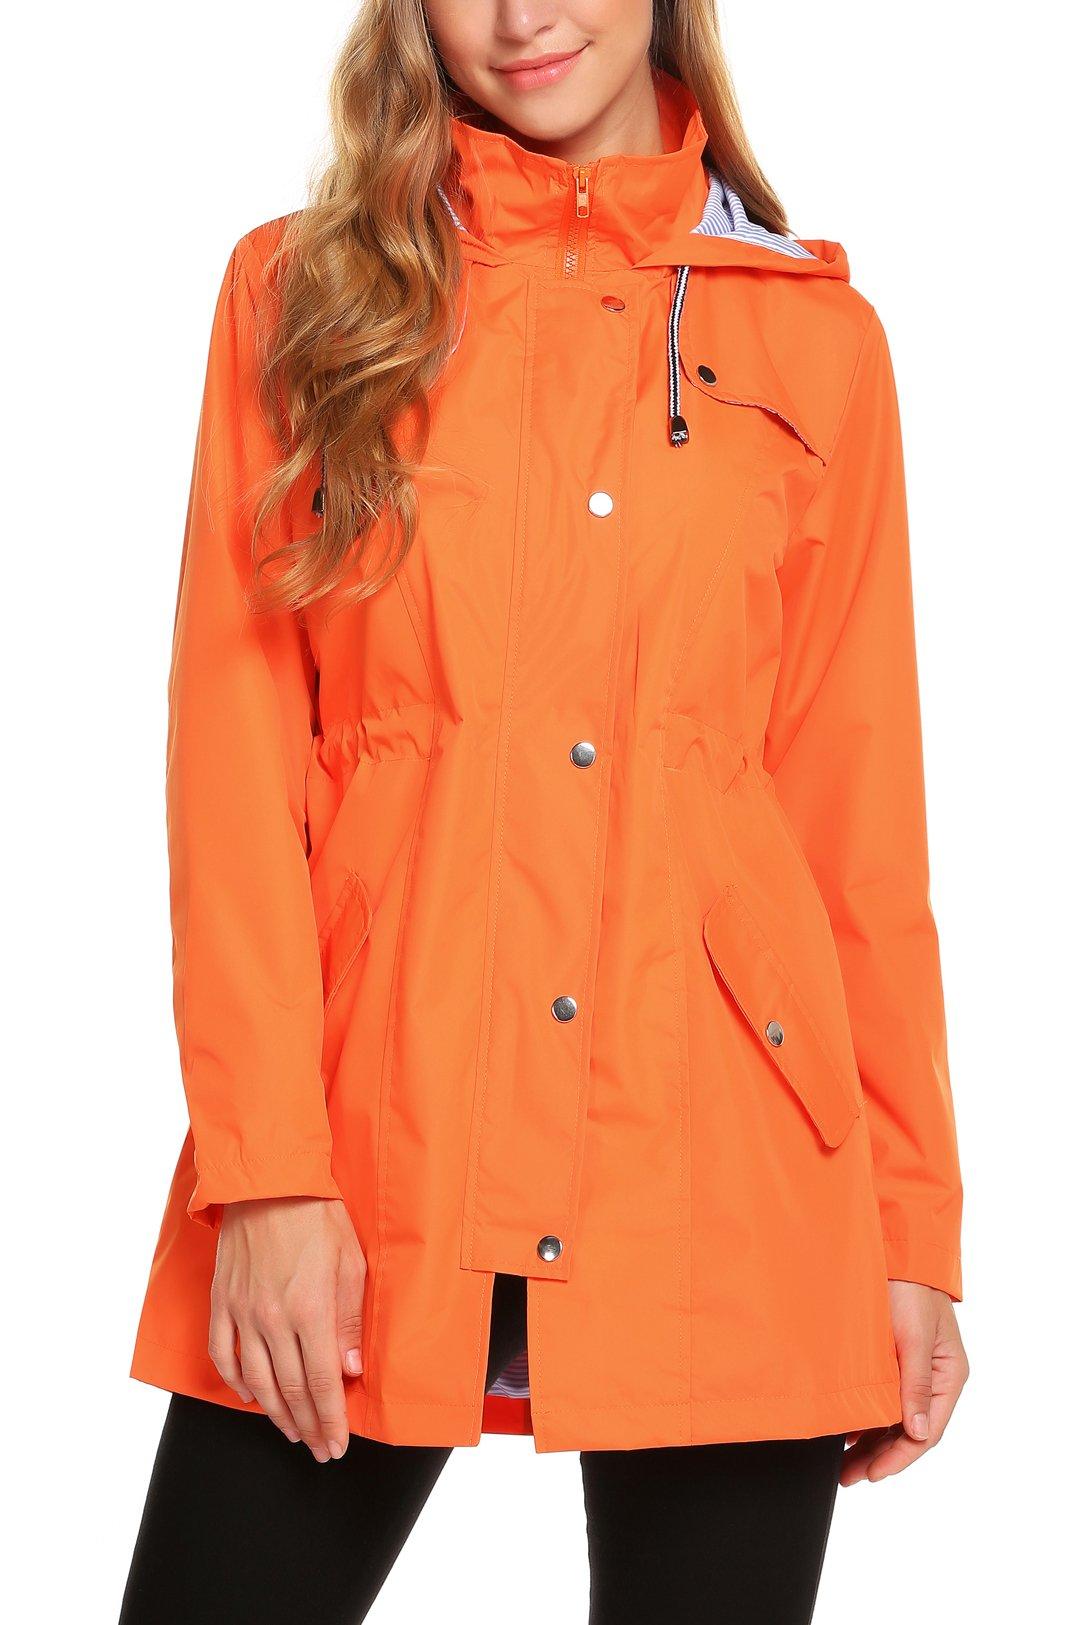 Women Casual Raincoats Active Outdoor Hooded Long Sleeve Waterproof Windproof Lightweight Jacket Orange by ZHENWEI